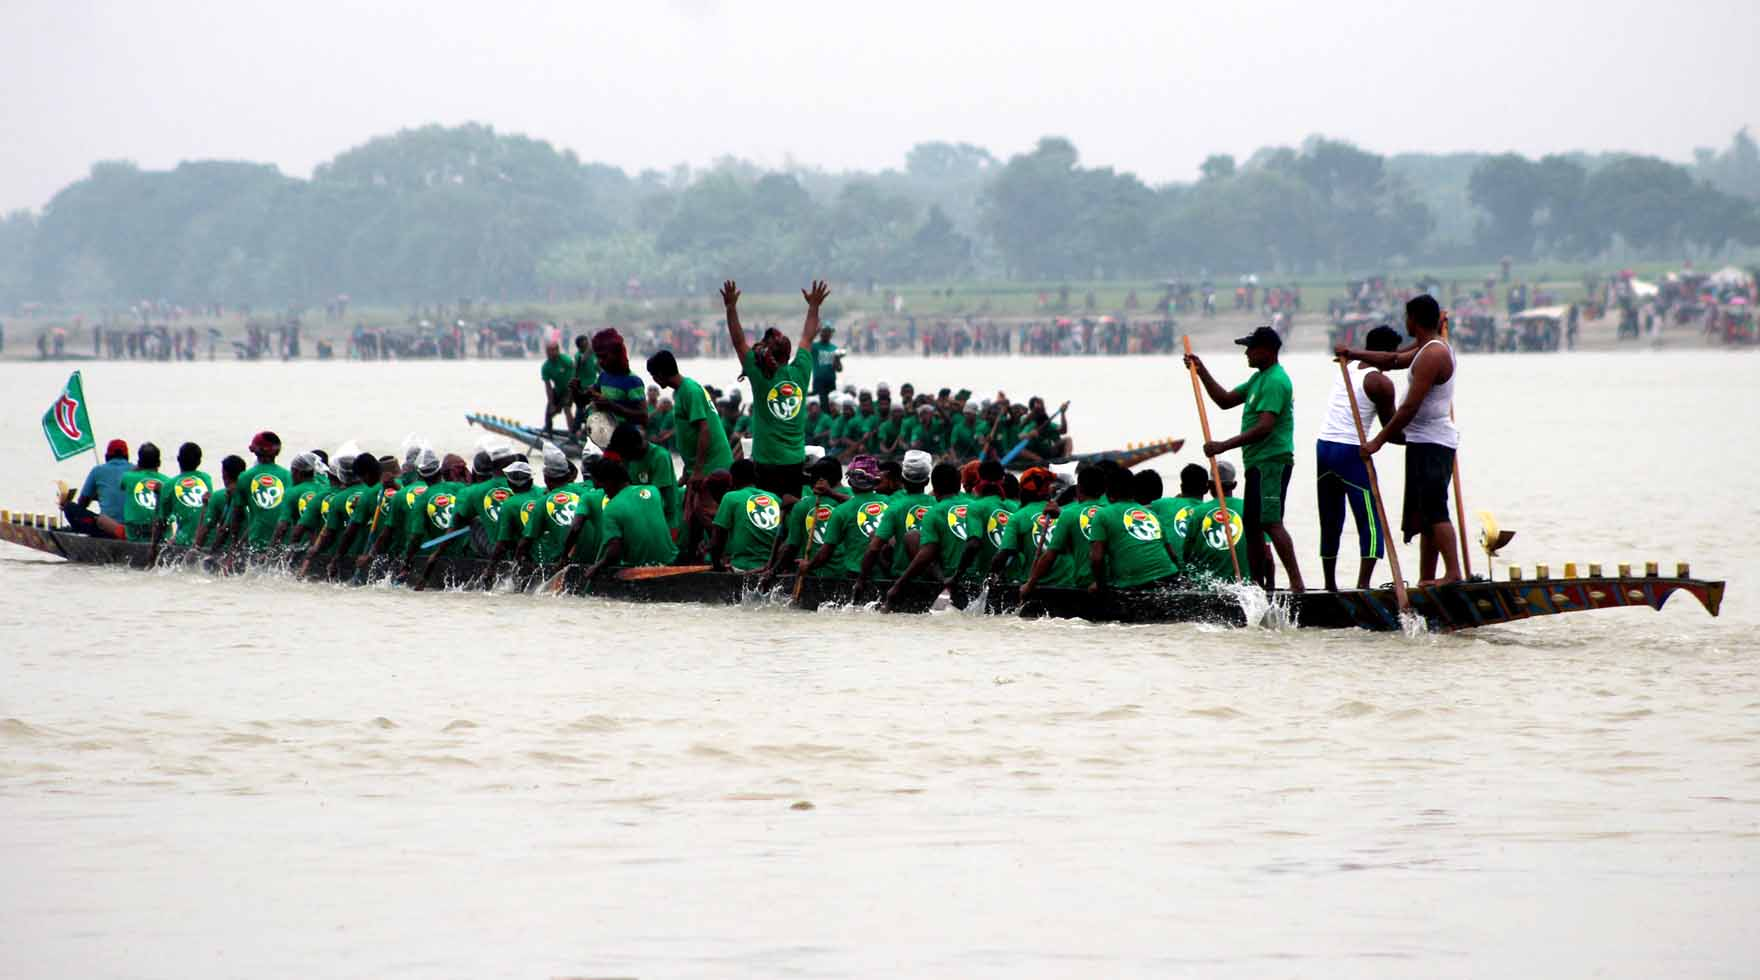 magura-boat-race-pic-02